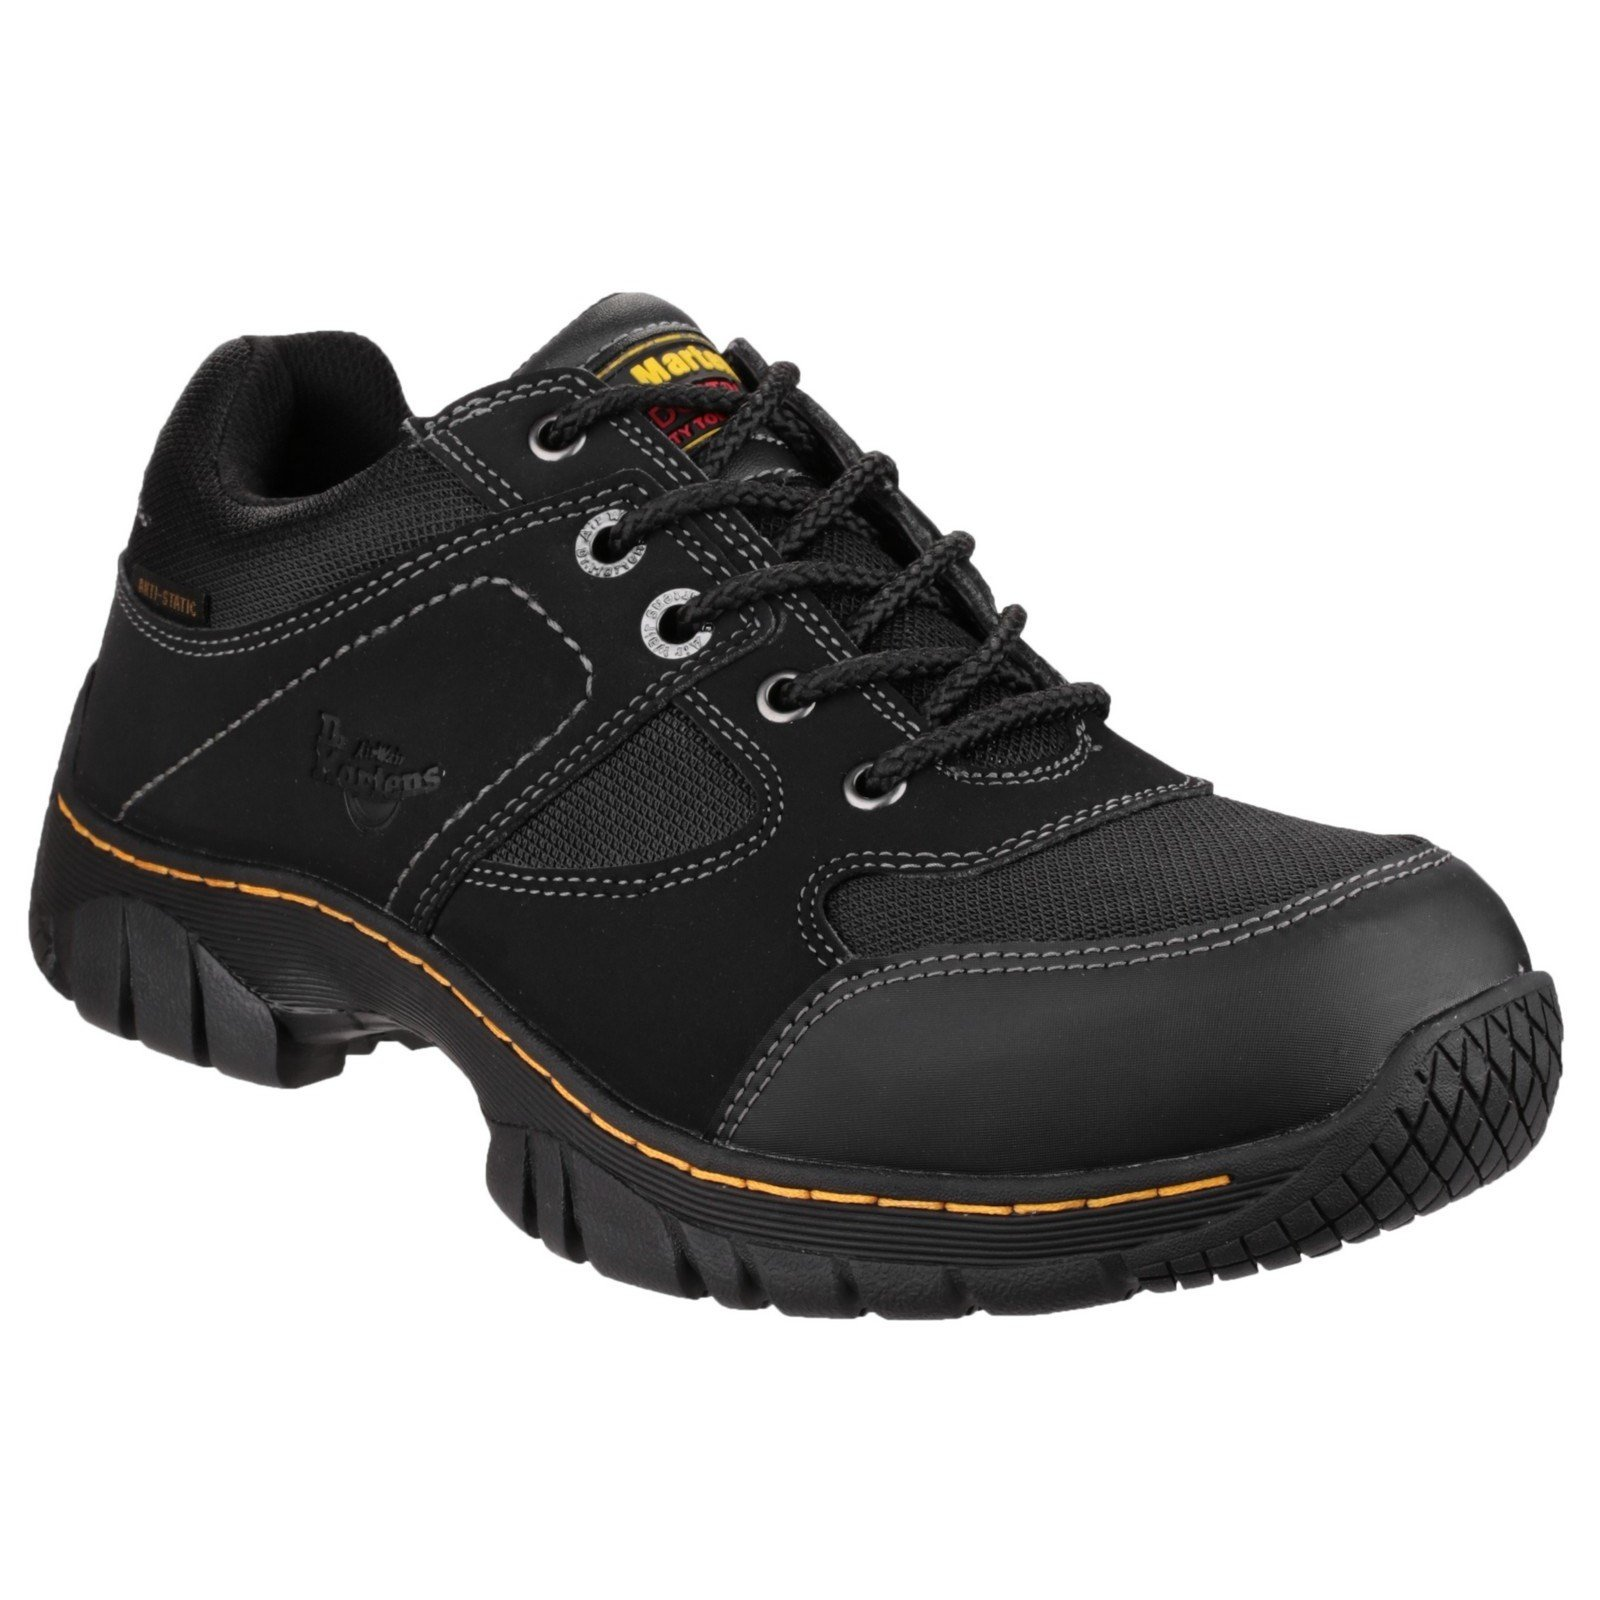 Dr Martens Unisex Gunaldo Safety Trainer Black 21648 - Black 13